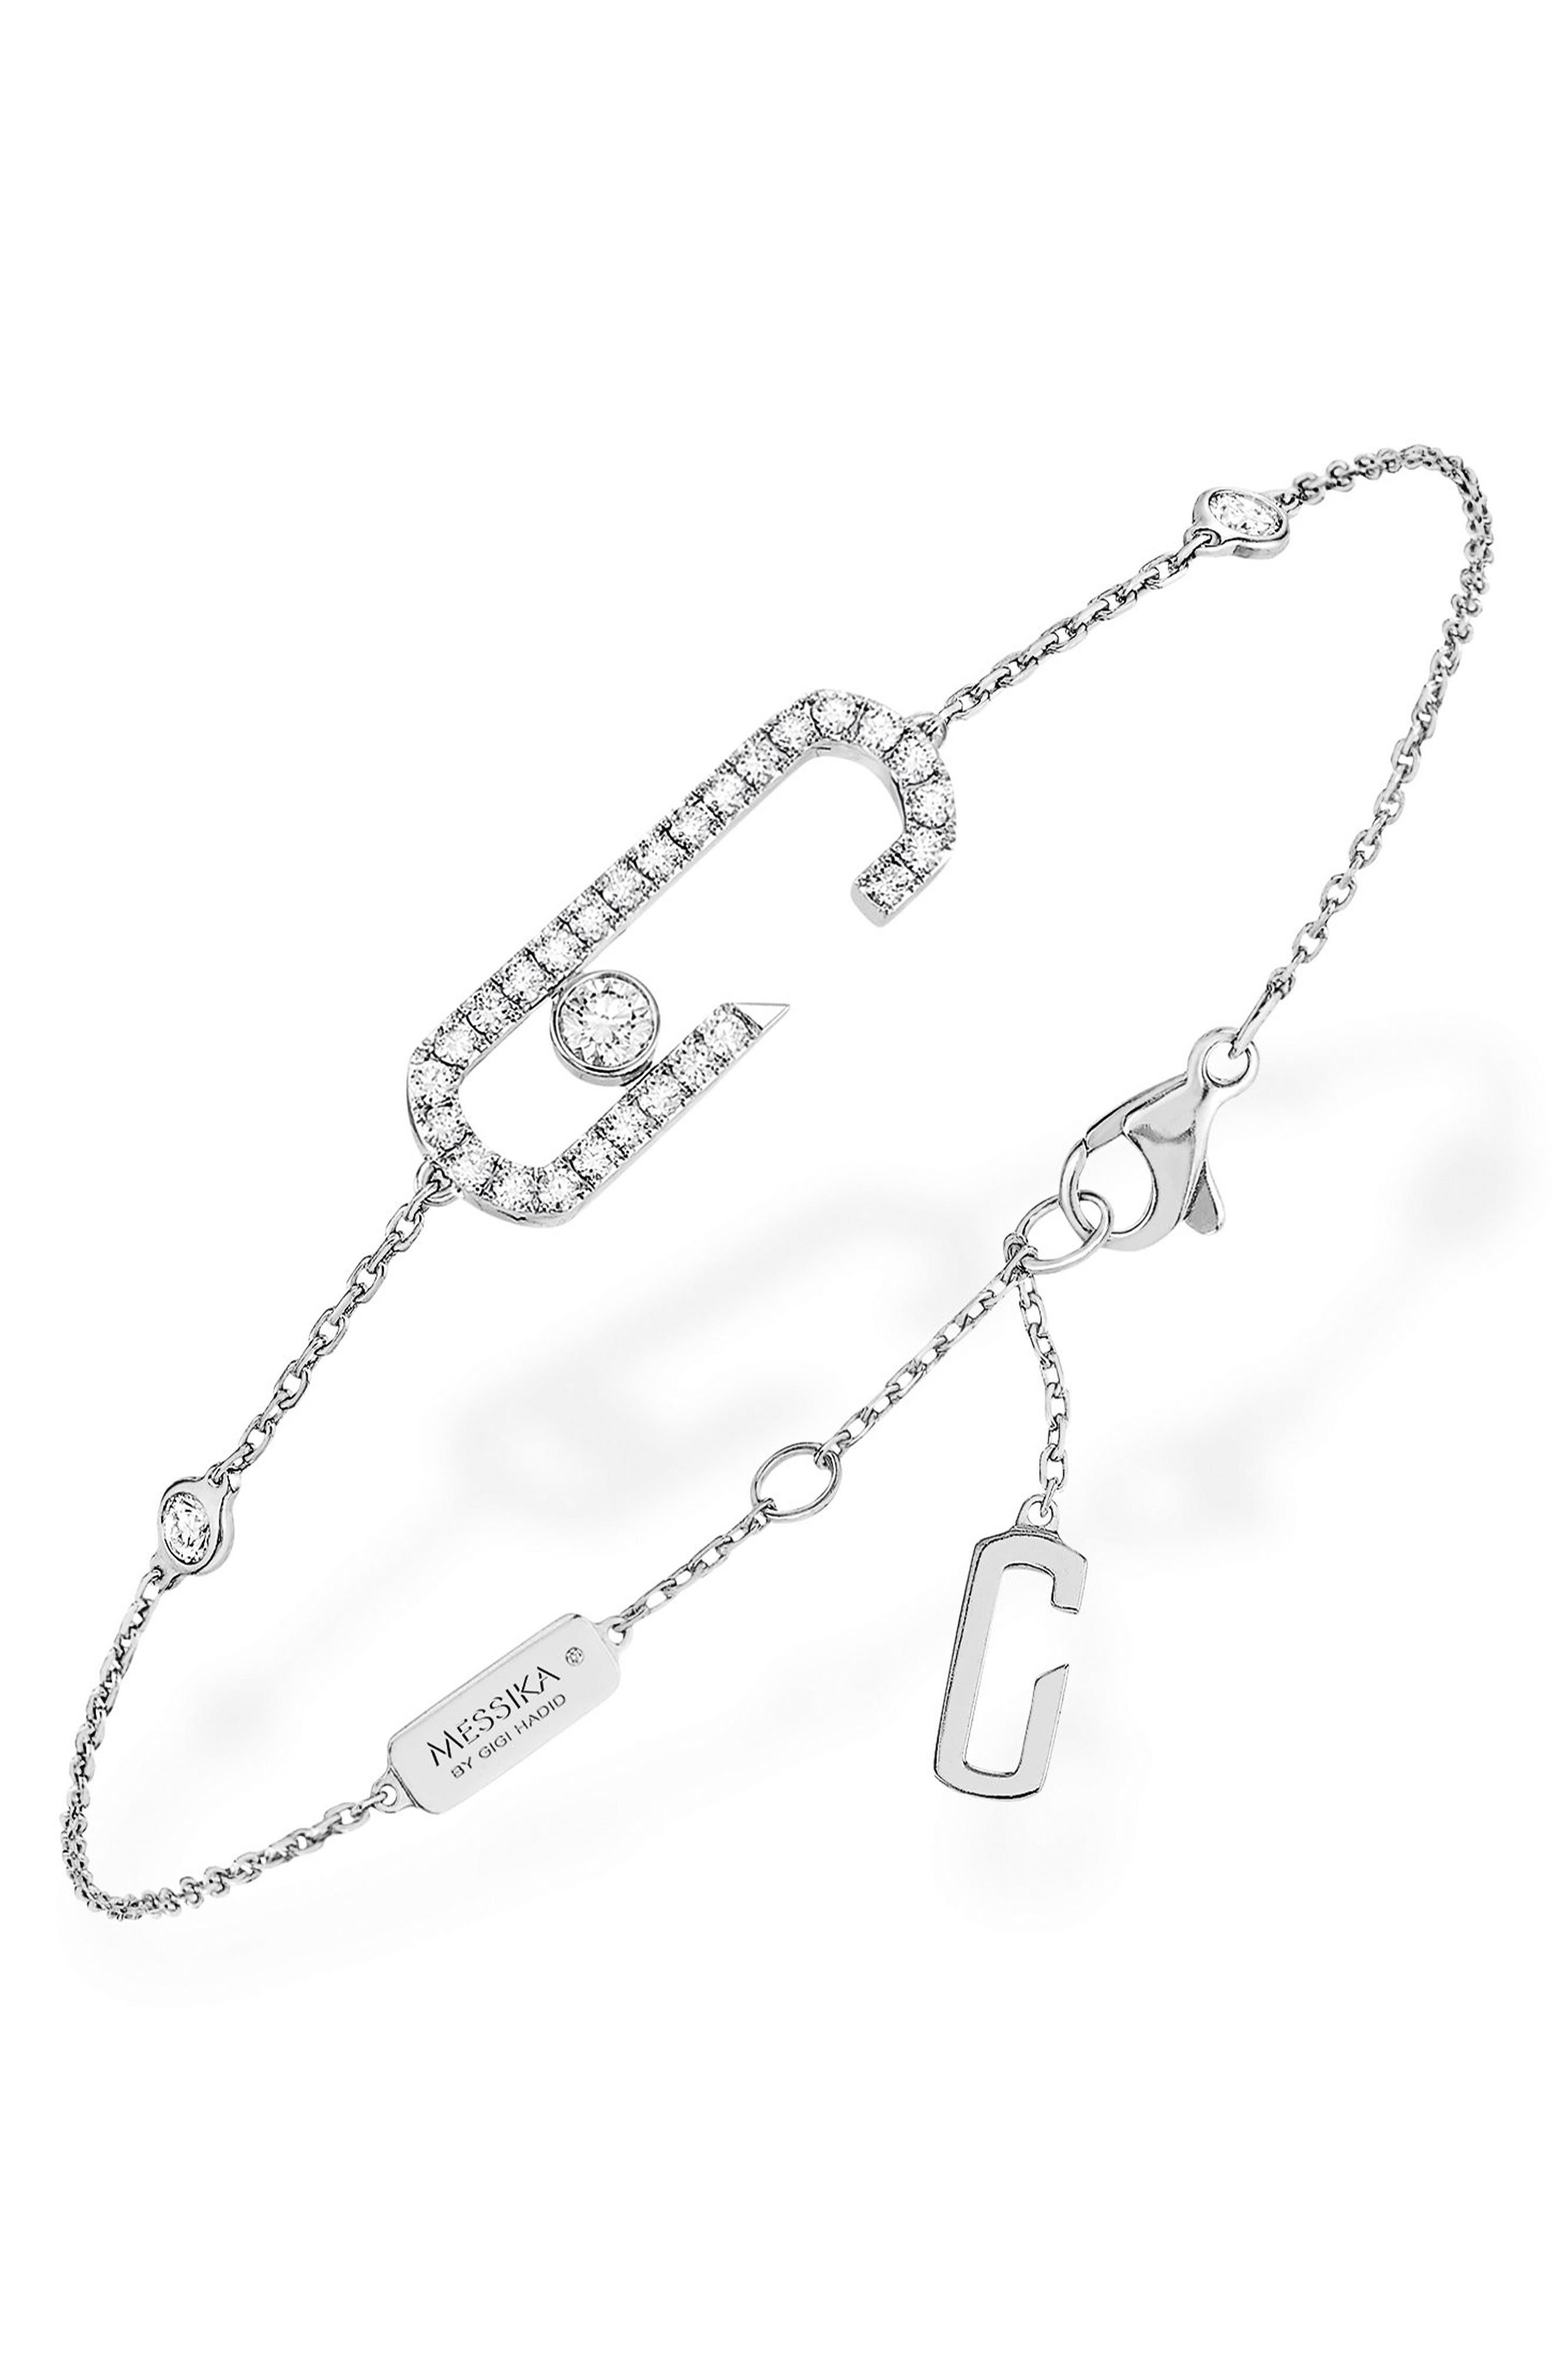 Move Addiction by Gigi Hadid Diamond Pavé Line Bracelet,                             Main thumbnail 1, color,                             WHITE GOLD